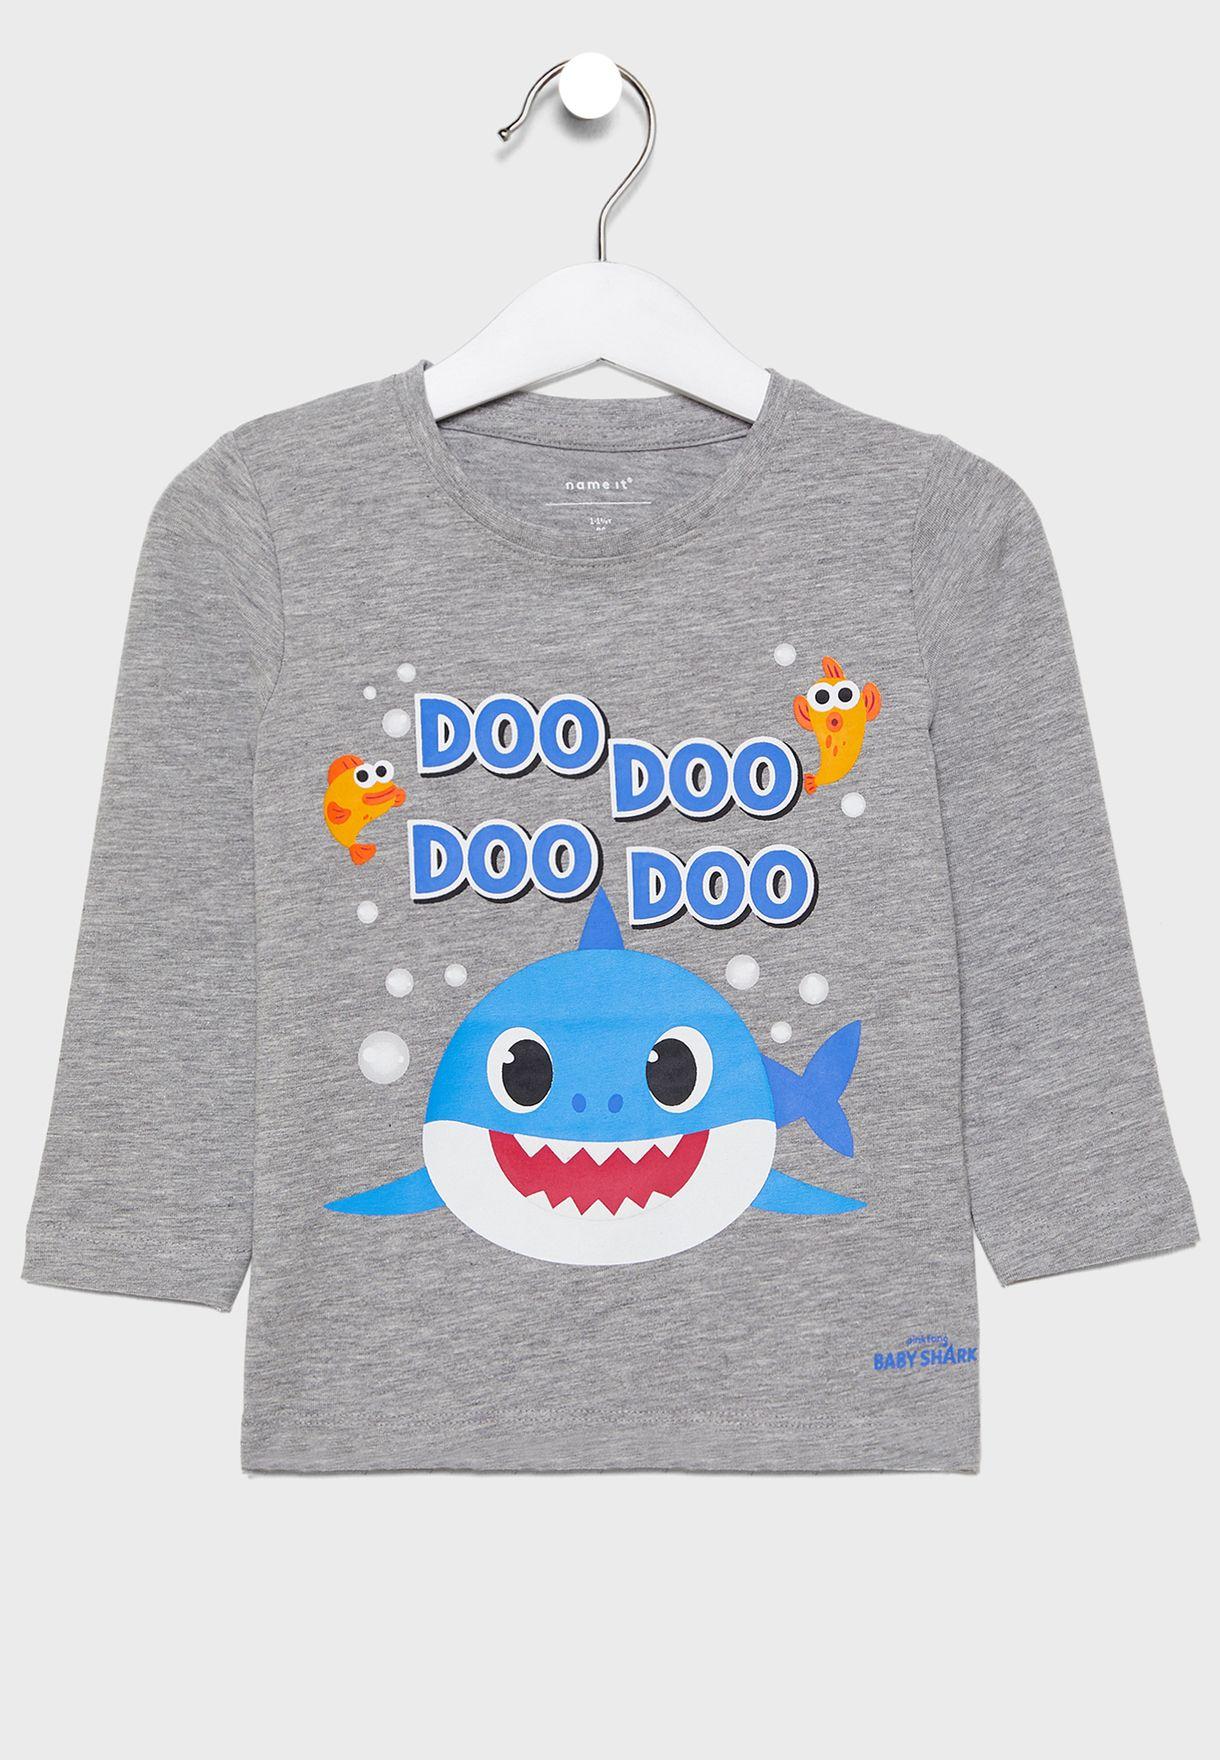 Buy Name It Grey Kids Baby Shark T Shirt For Kids In Mena Worldwide 13180622